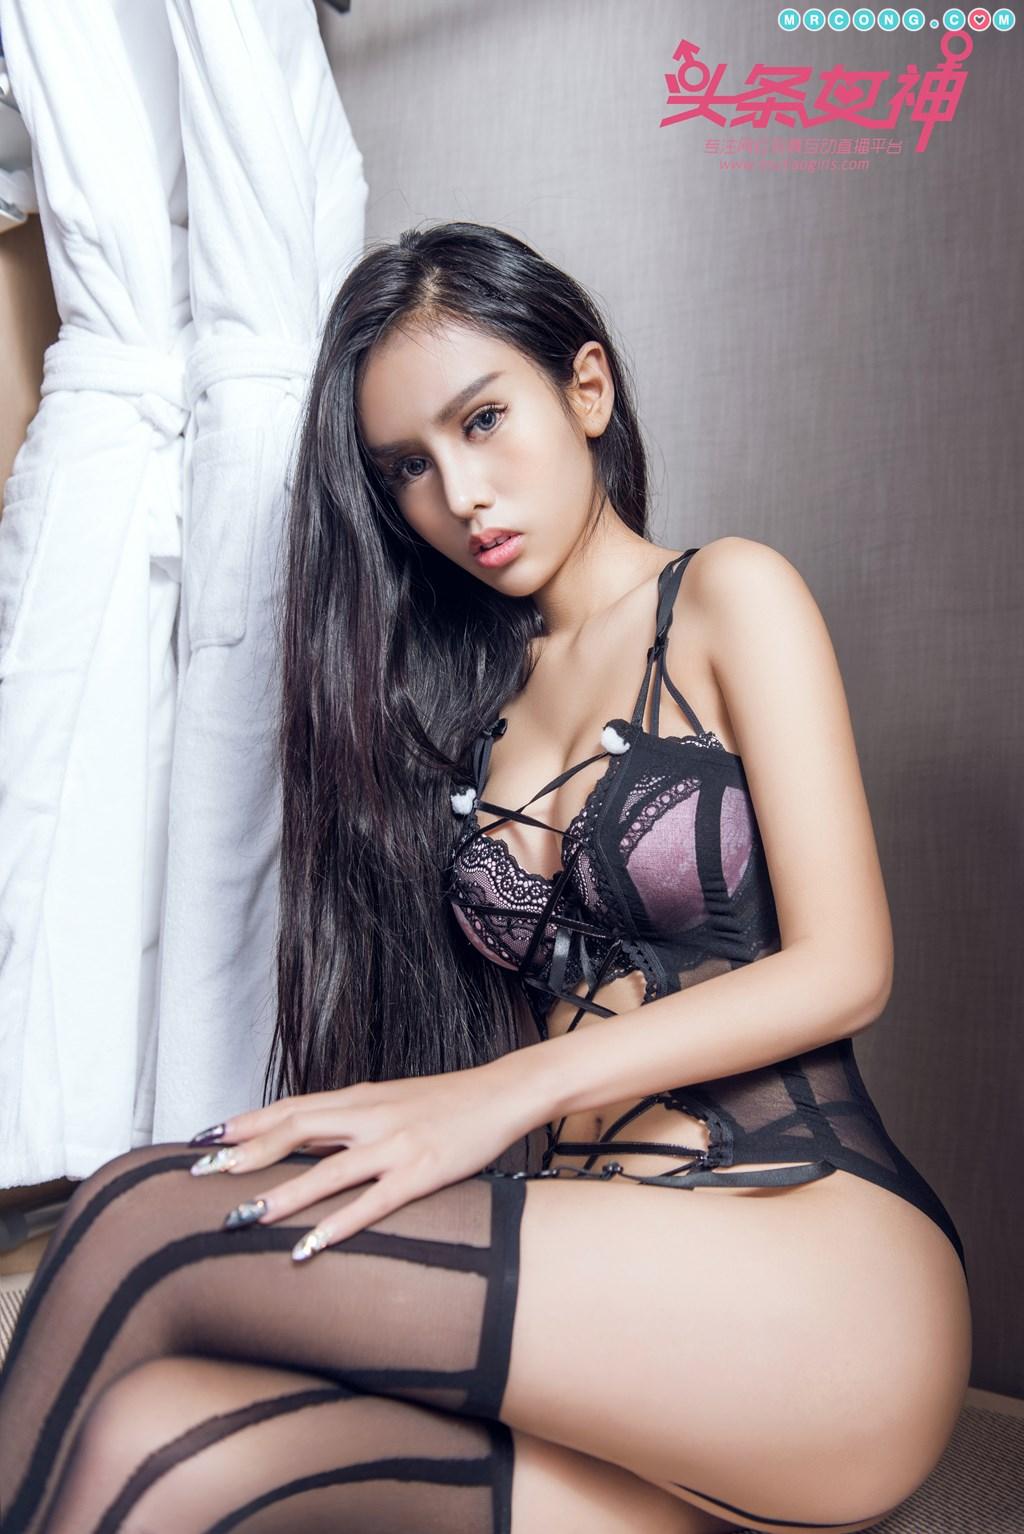 Image TouTiao-2017-12-05-Chen-Di-Ya-MrCong.com-029 in post TouTiao 2017-12-05: Người mẫu Chen Di Ya (陈迪垭) (35 ảnh)